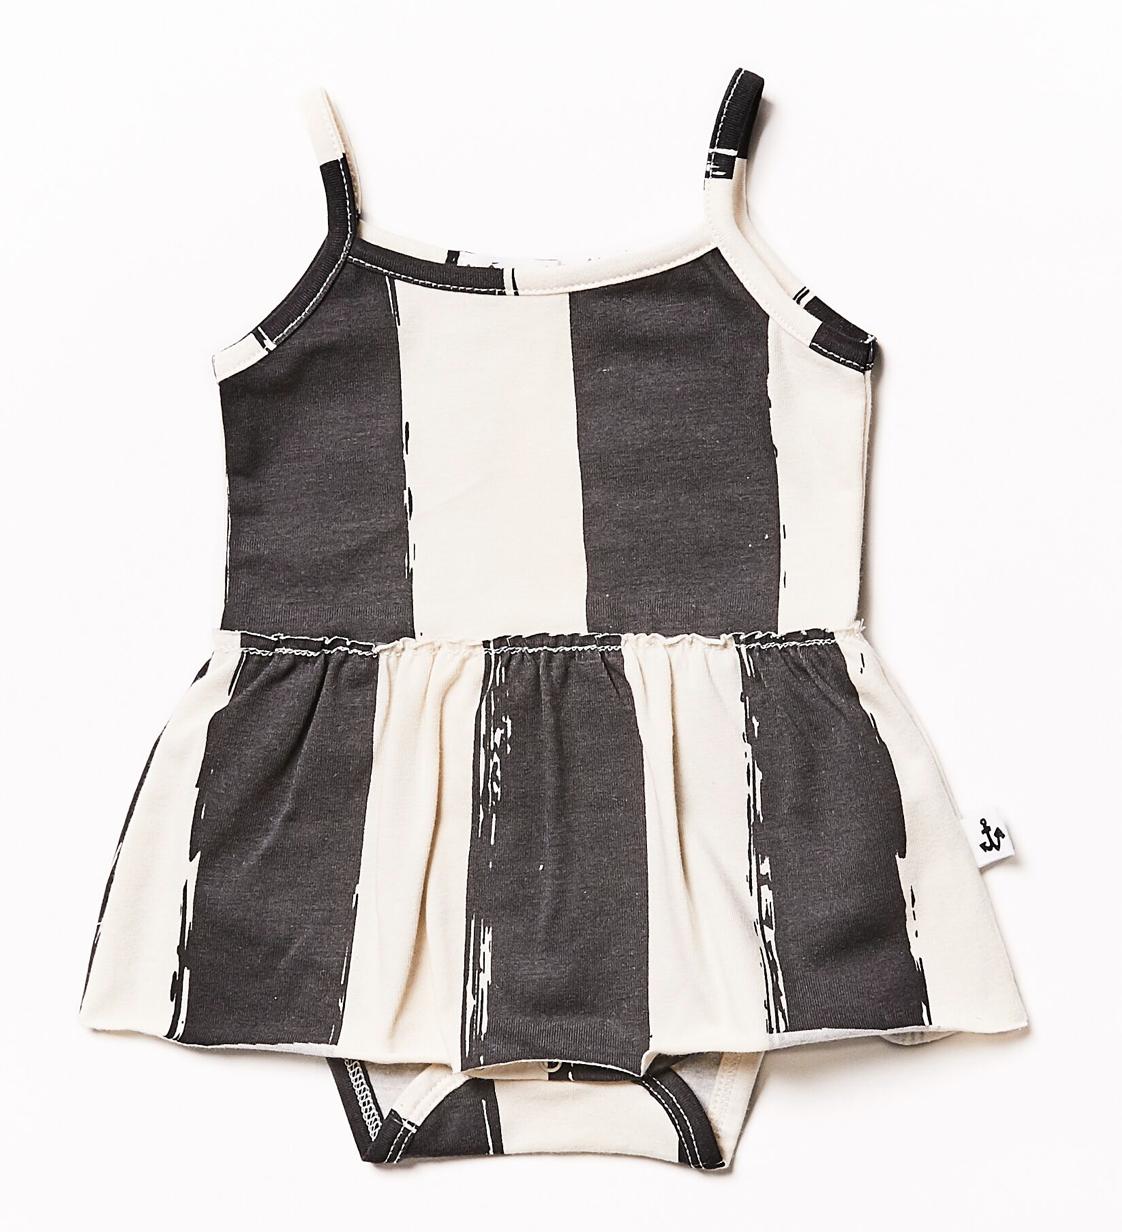 Noe & Zoe Tank Body With Skirt